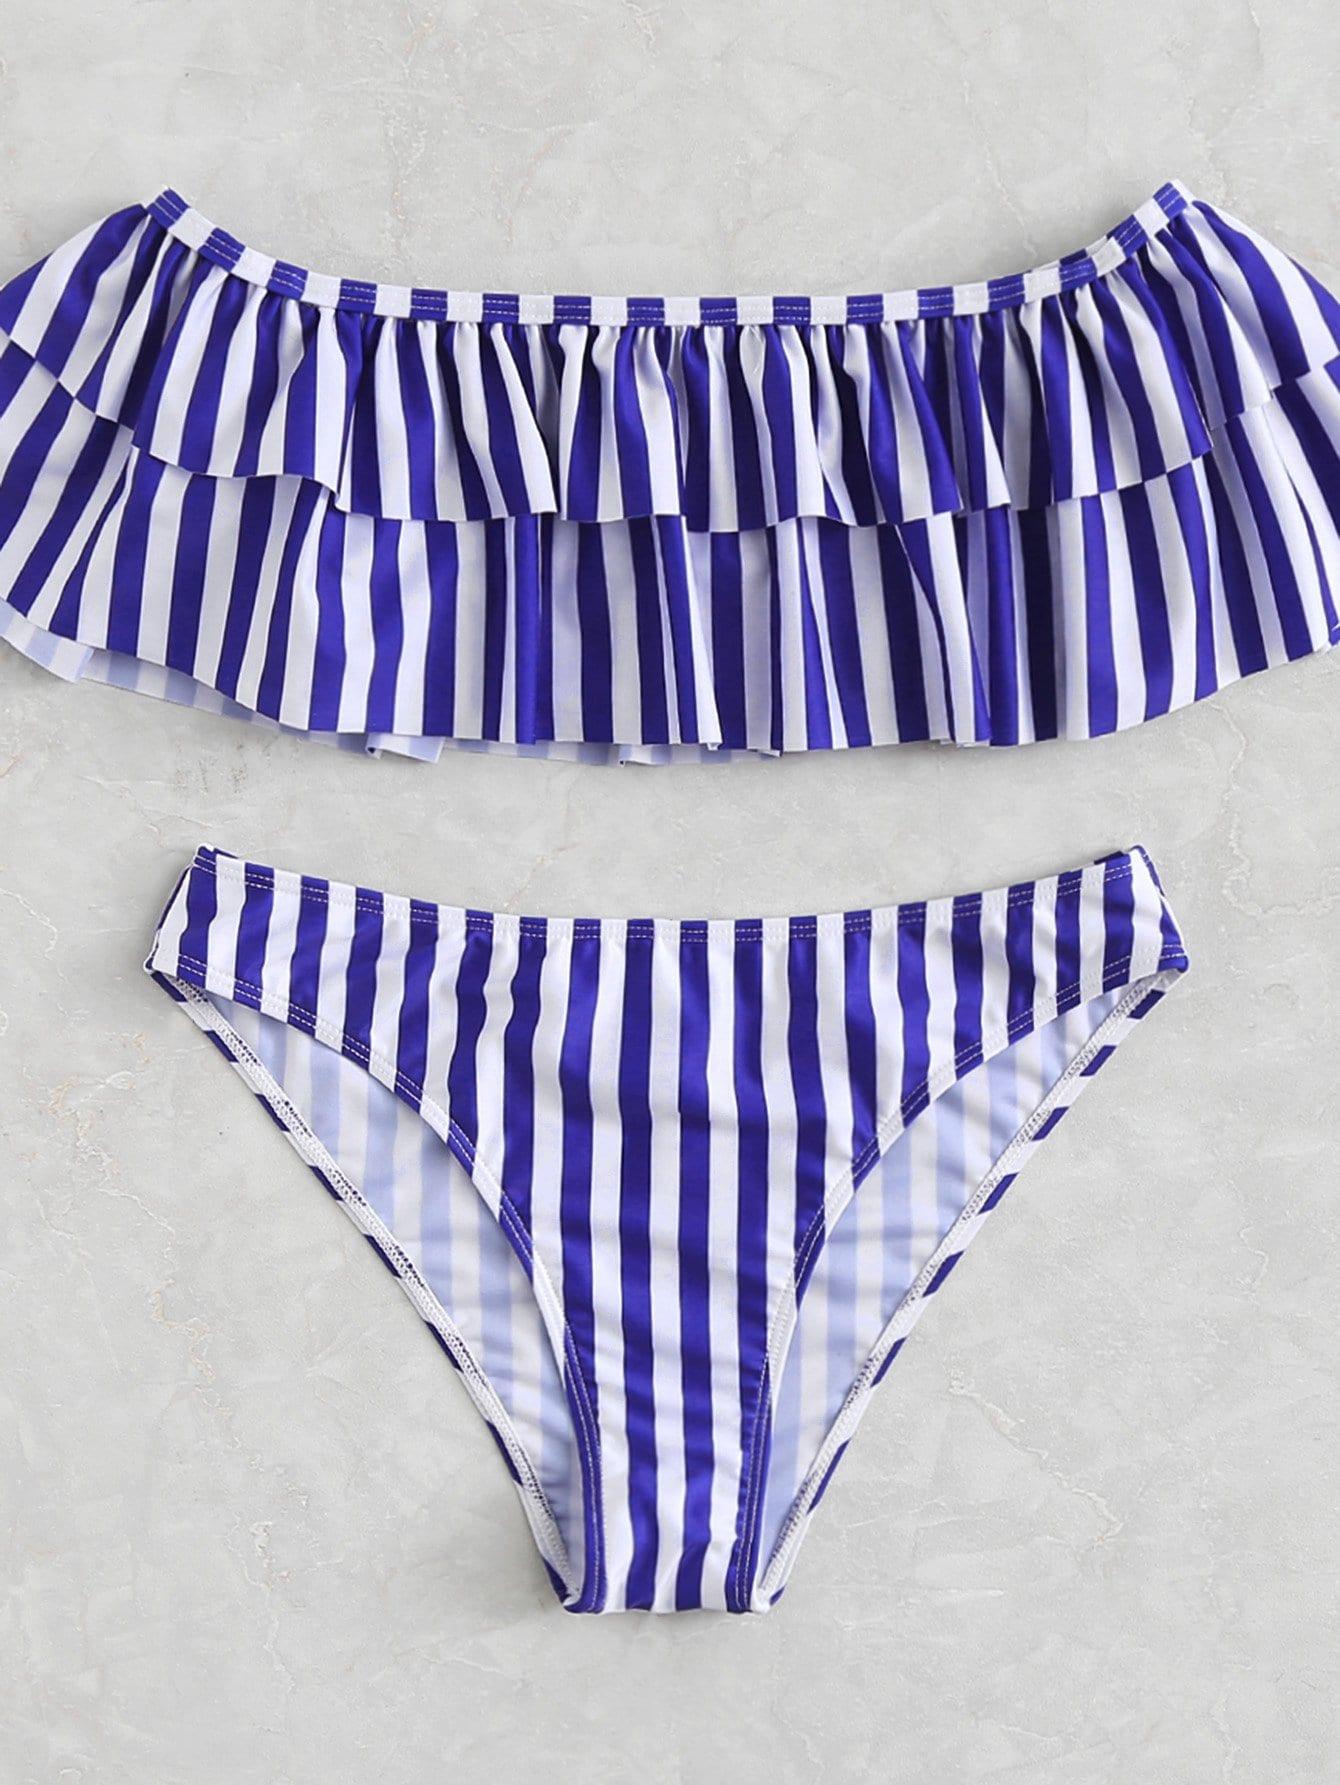 Ruffle Trim Striped Bardot Bikini Set crochet ruffle trim halter bikini set